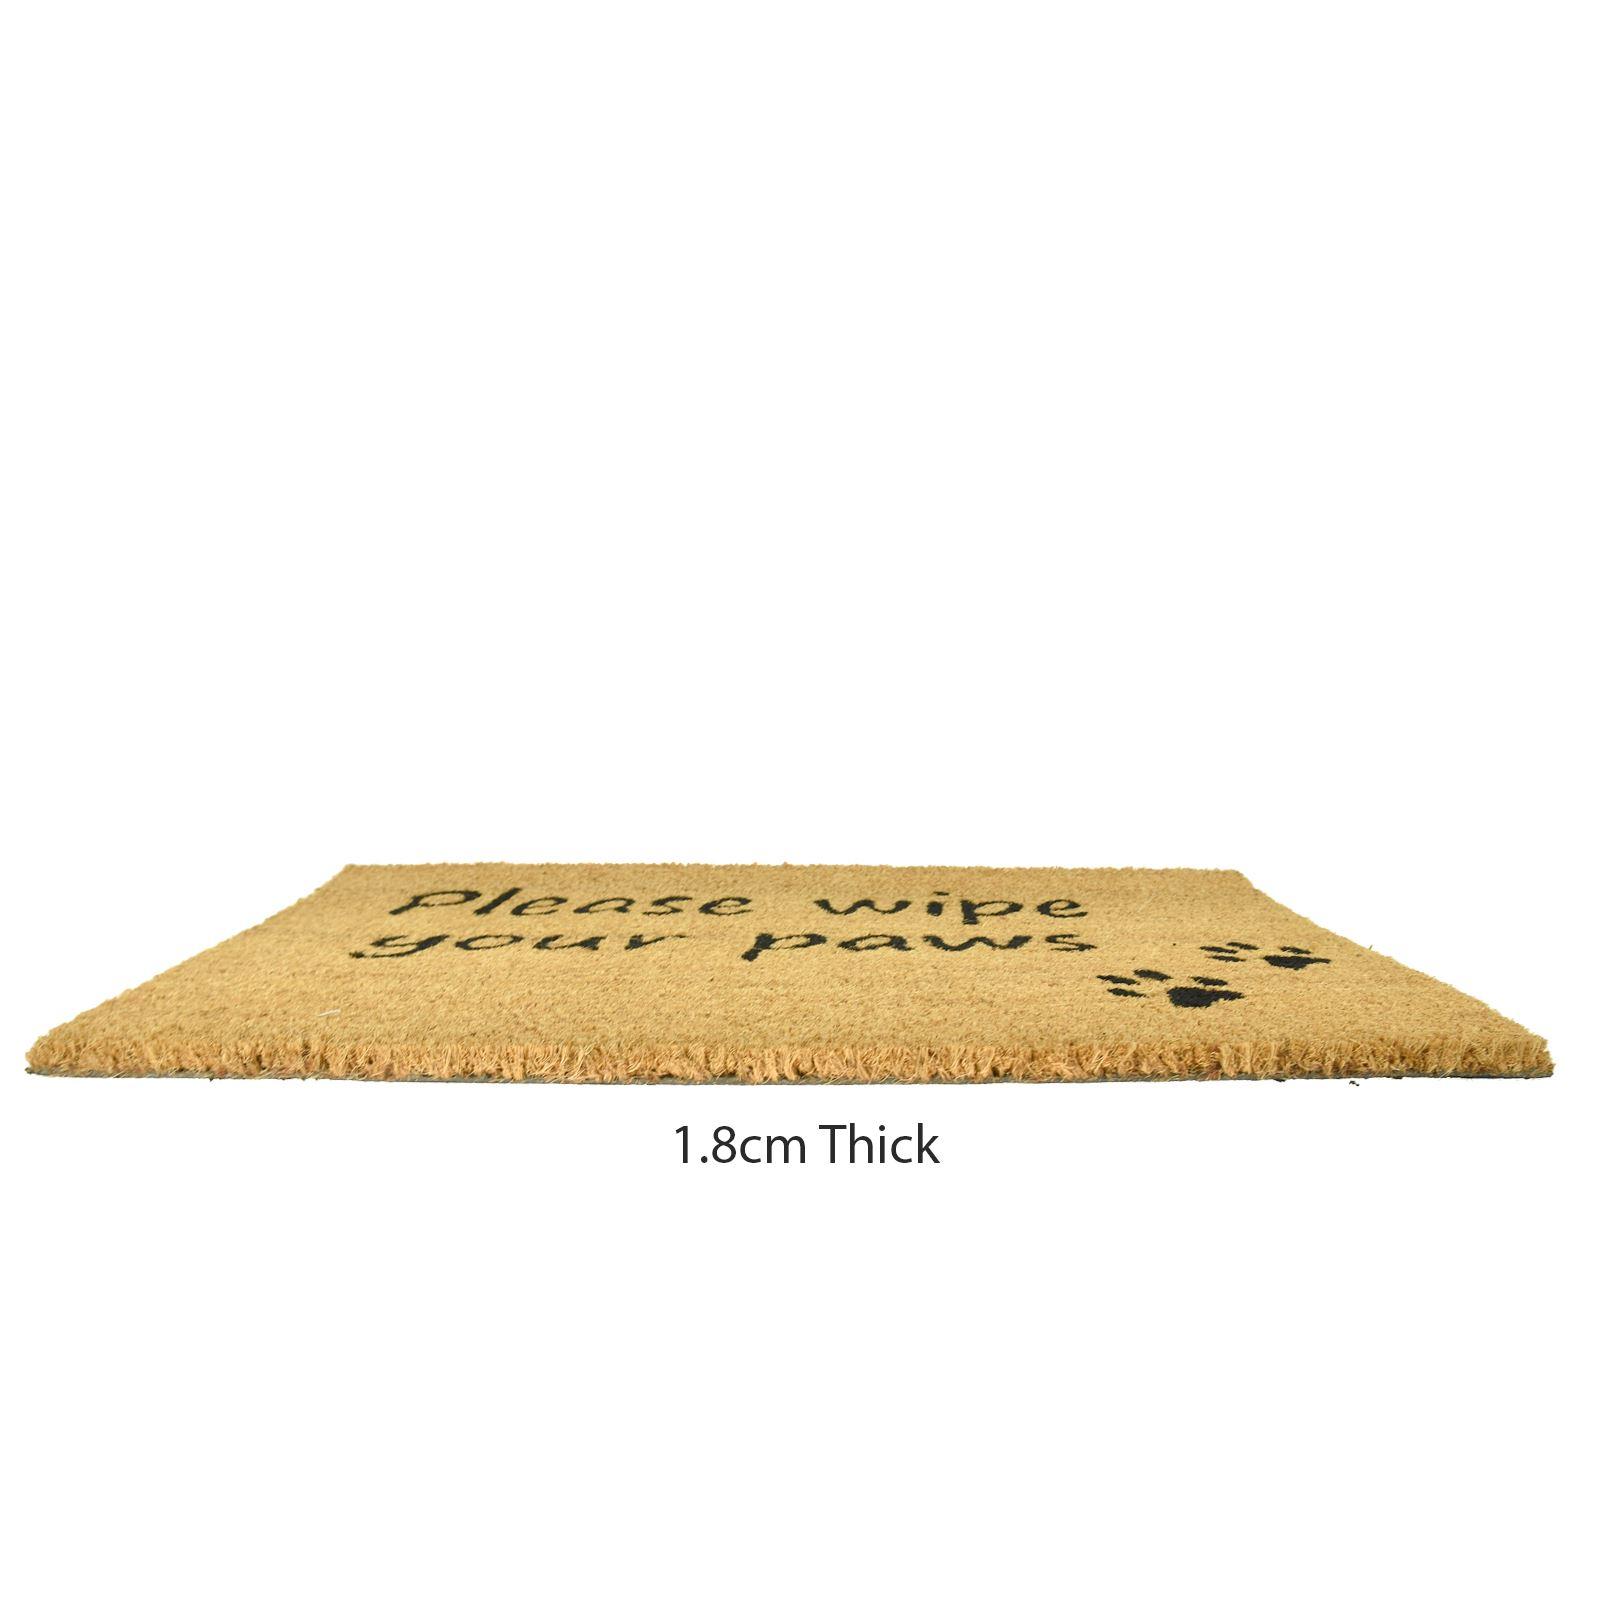 Plain-Non-Slip-Door-Mat-Tough-Natural-Coir-PVC-Back-Welcome-Doormat-40-x-60cm miniatura 103